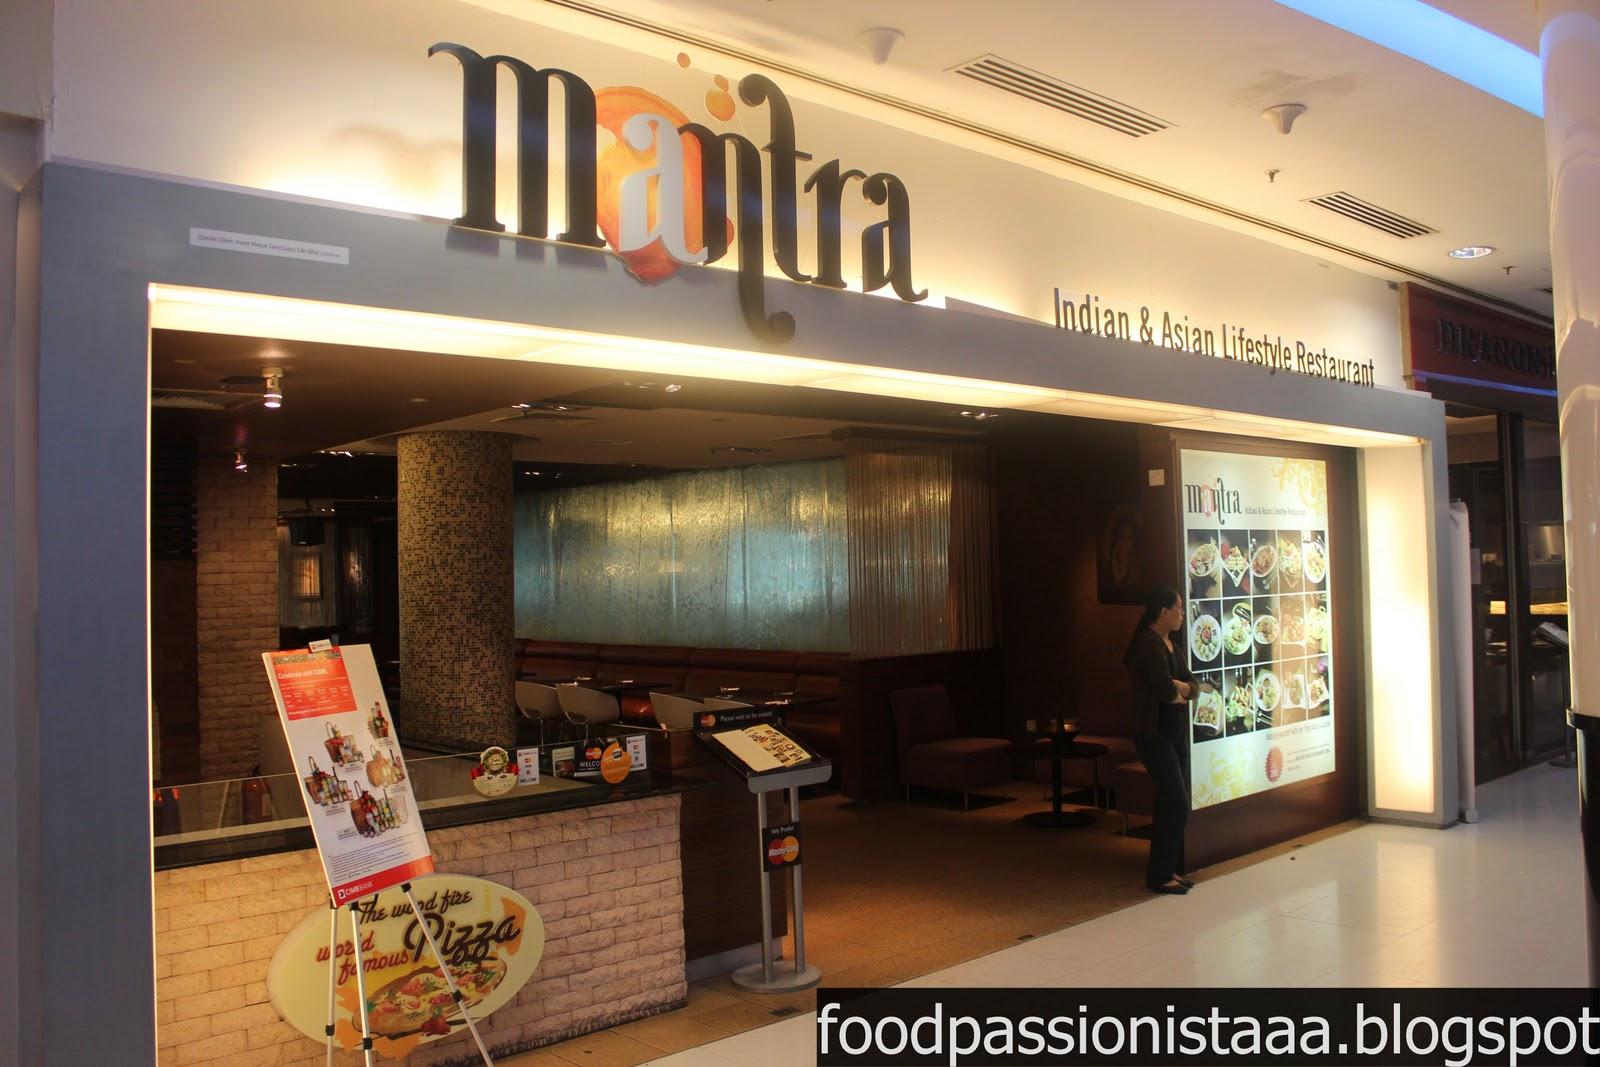 Mr Mrs Foodpacker Mantra Restaurant And Bar Sunway Pyramid